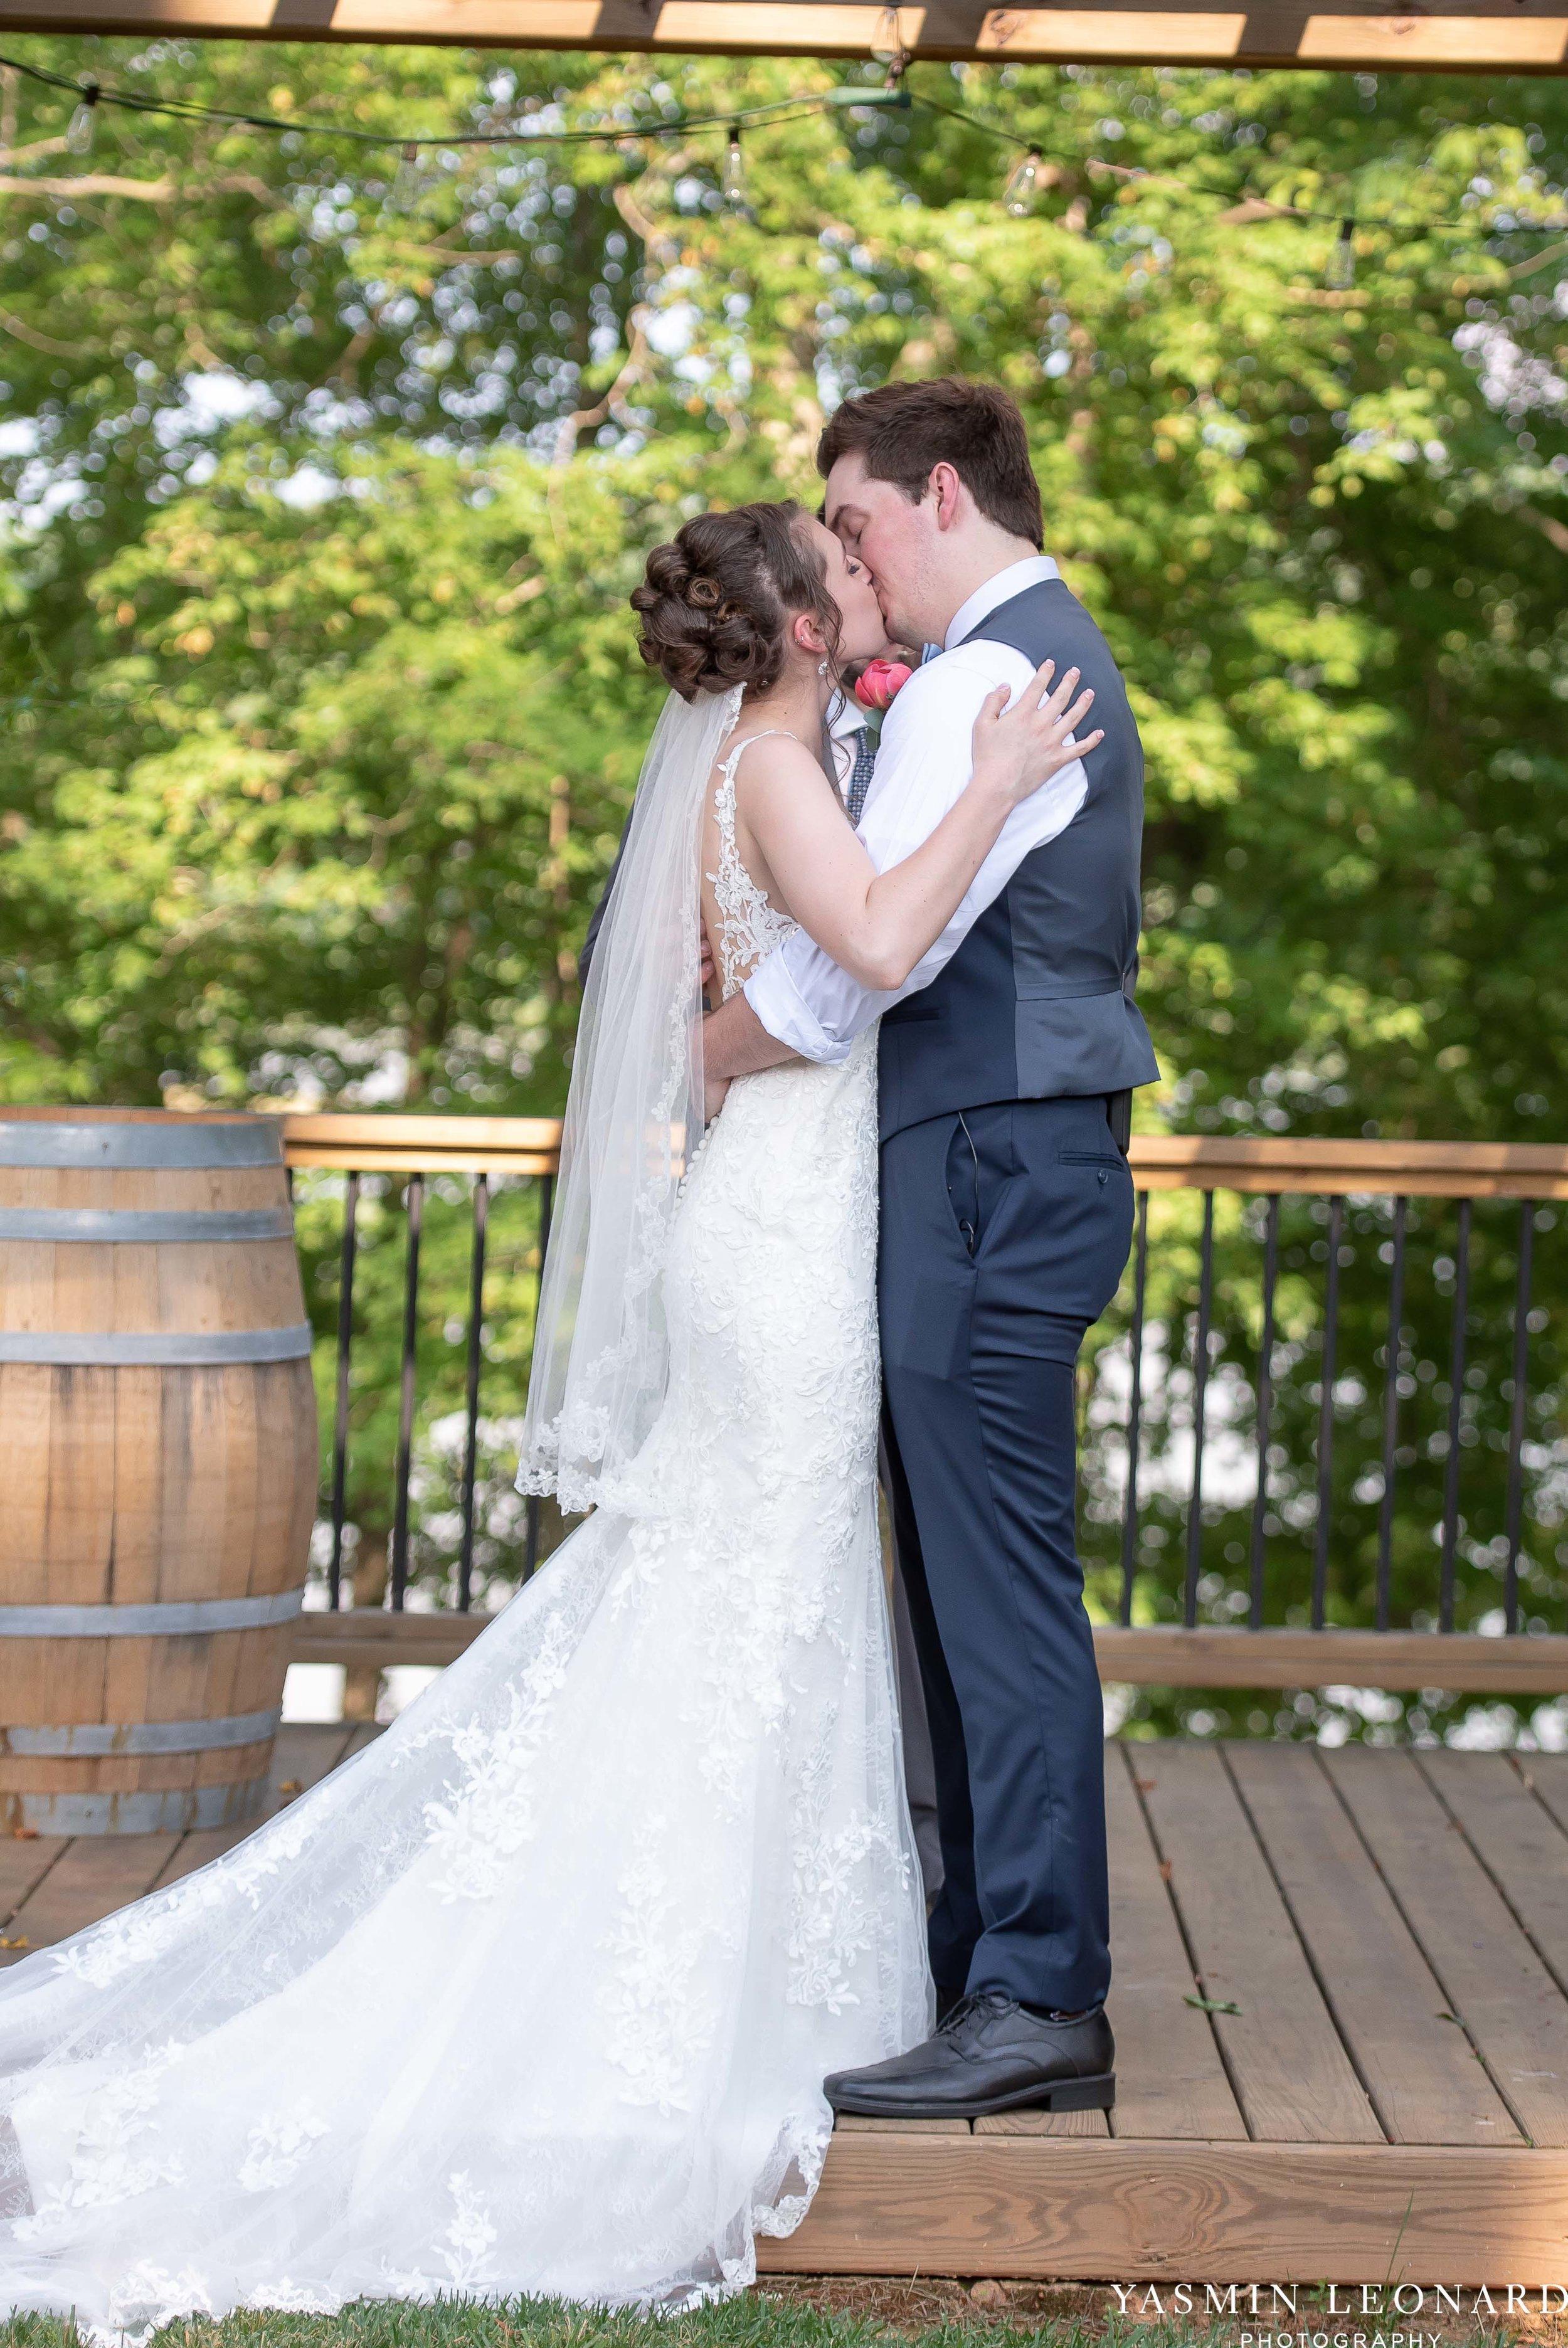 Old Homeplace Vineyard - NC Weddings - Outdoor Summer Weddings - Peony Boutique - Vineyard Wedding - NC Photographer - Yasmin Leonard Photography-32.jpg